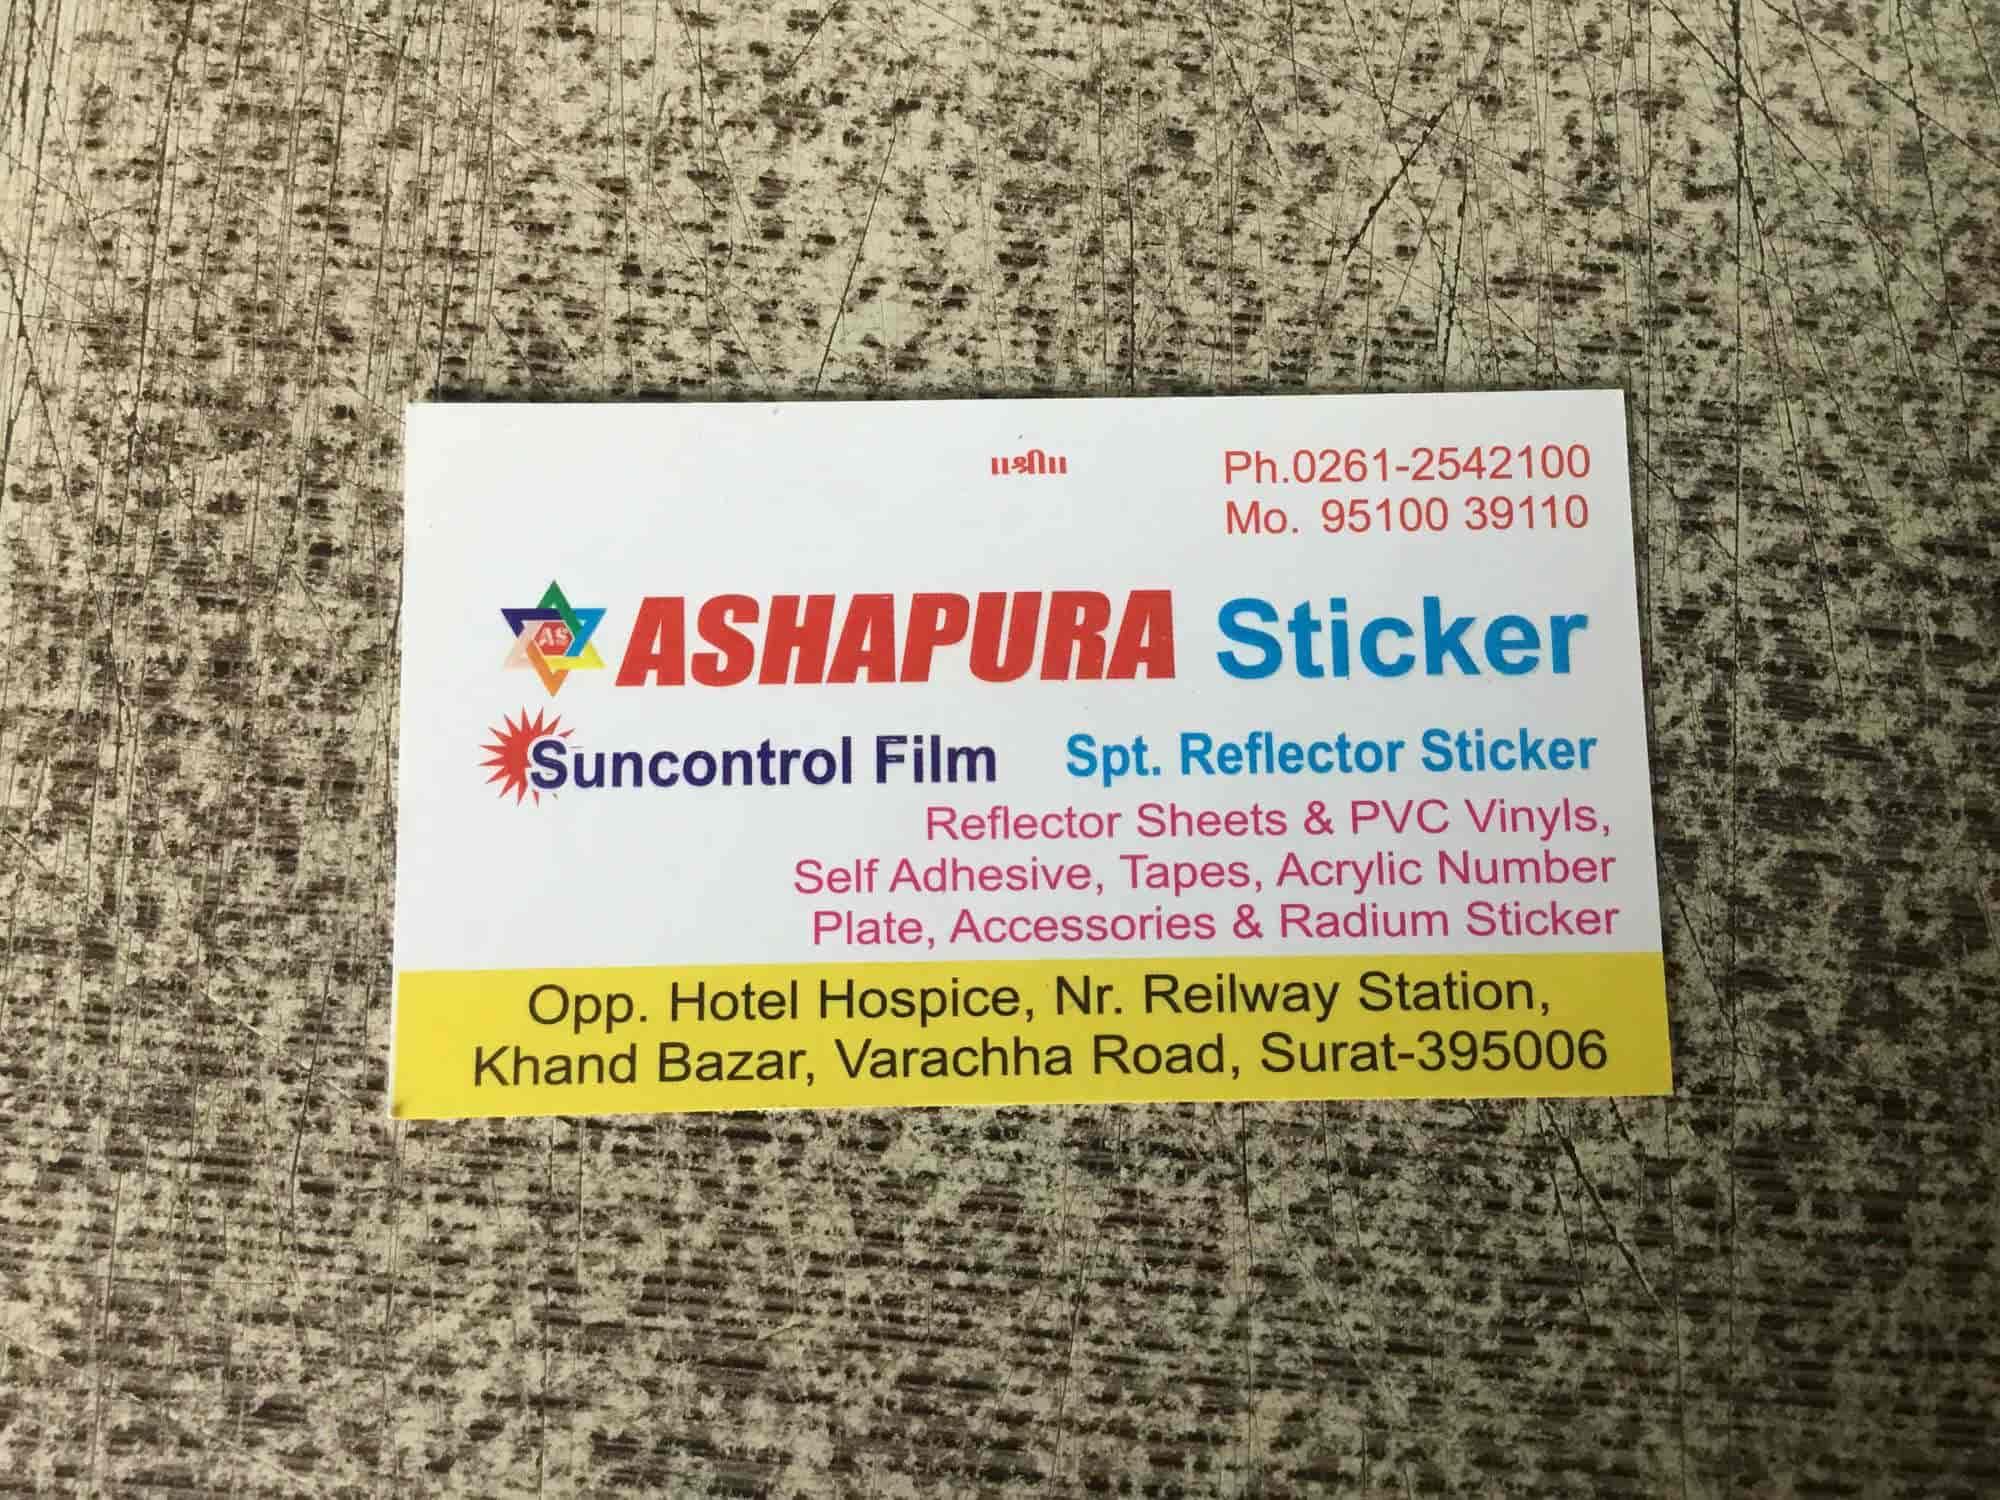 Ashapura sticker photos varachha road surat 2d sticker manufacturers